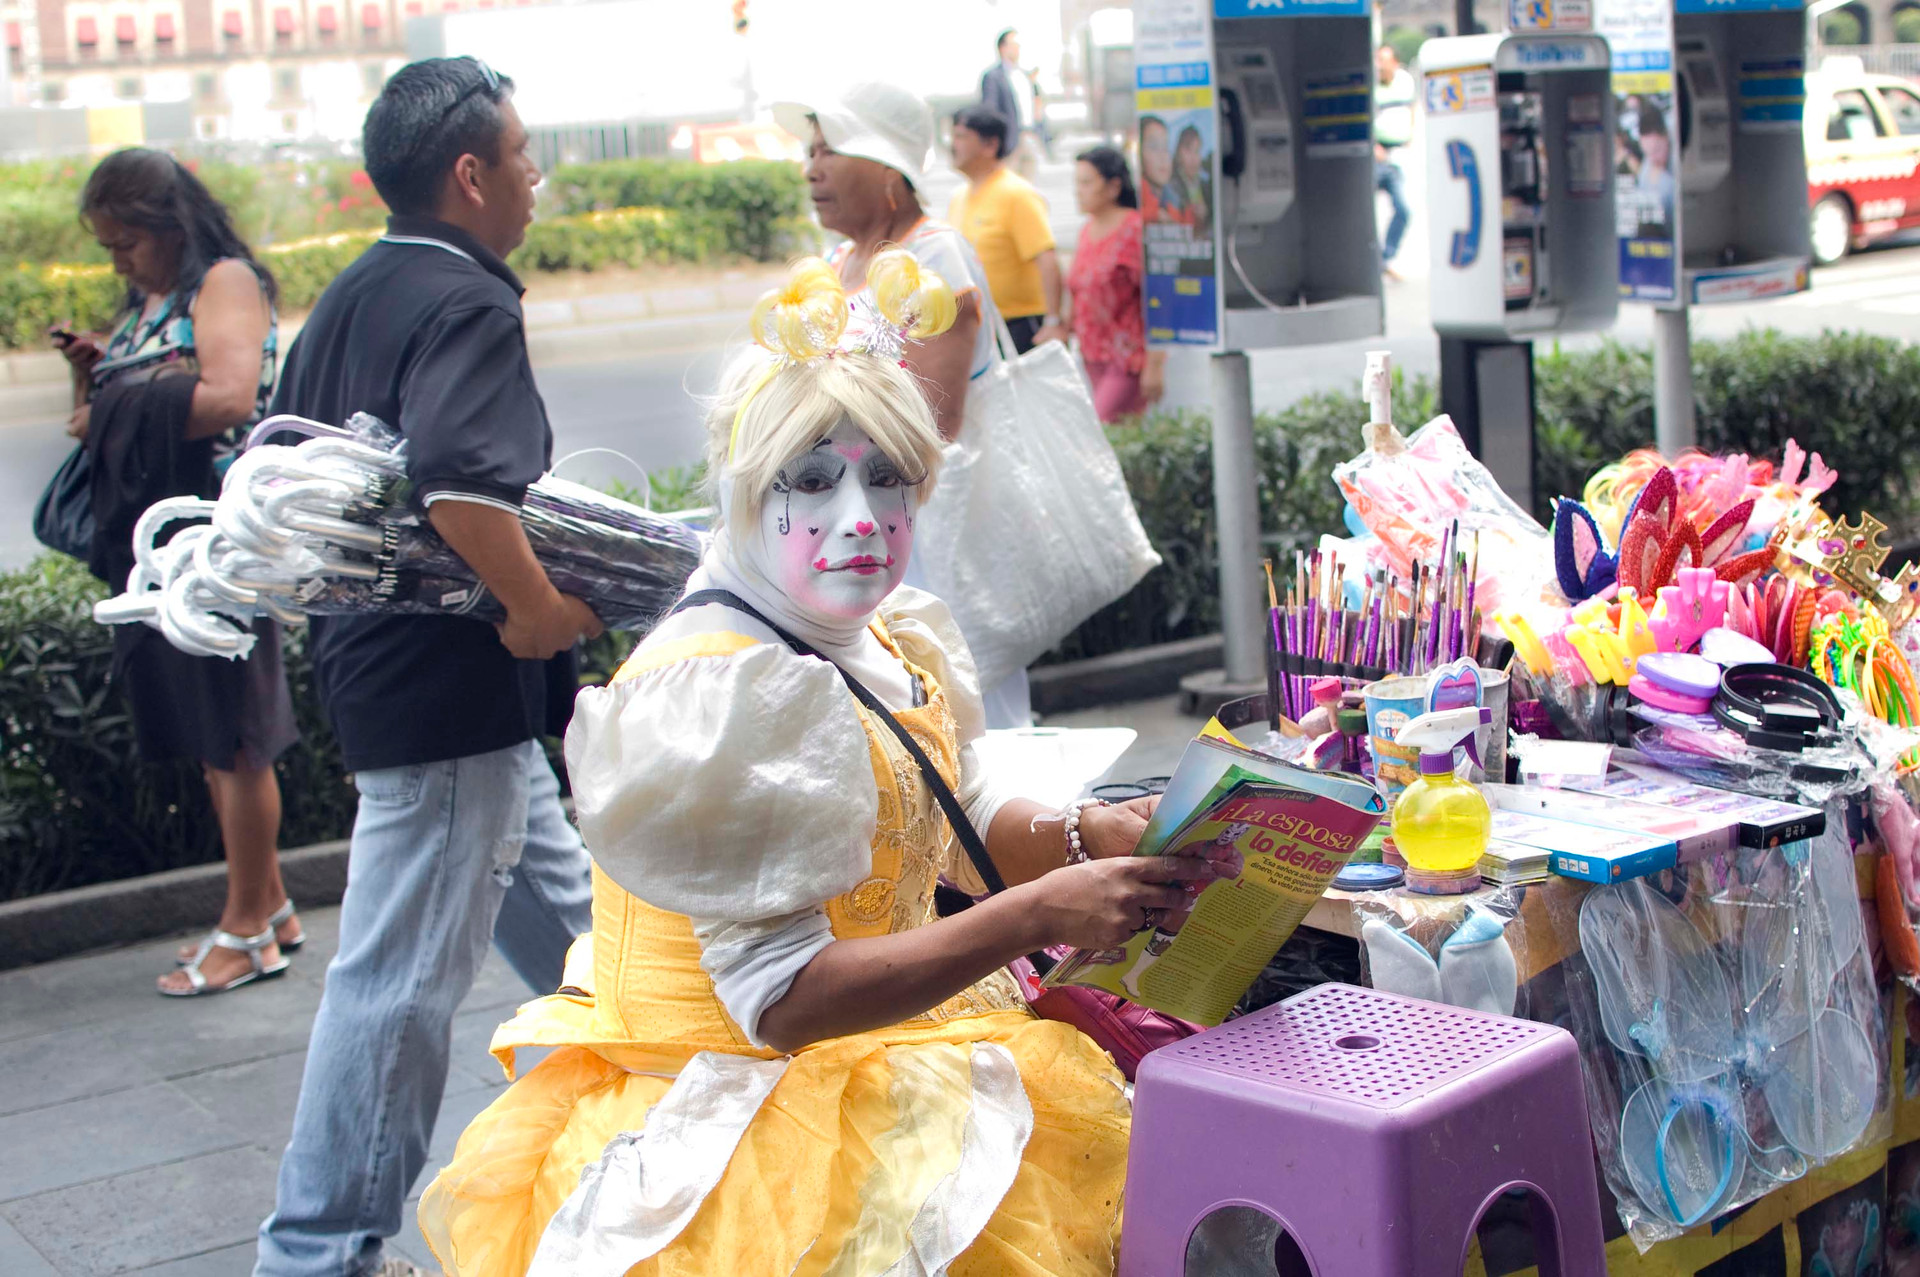 A face painter, Centro Histórico, Mexico D.F., 2014